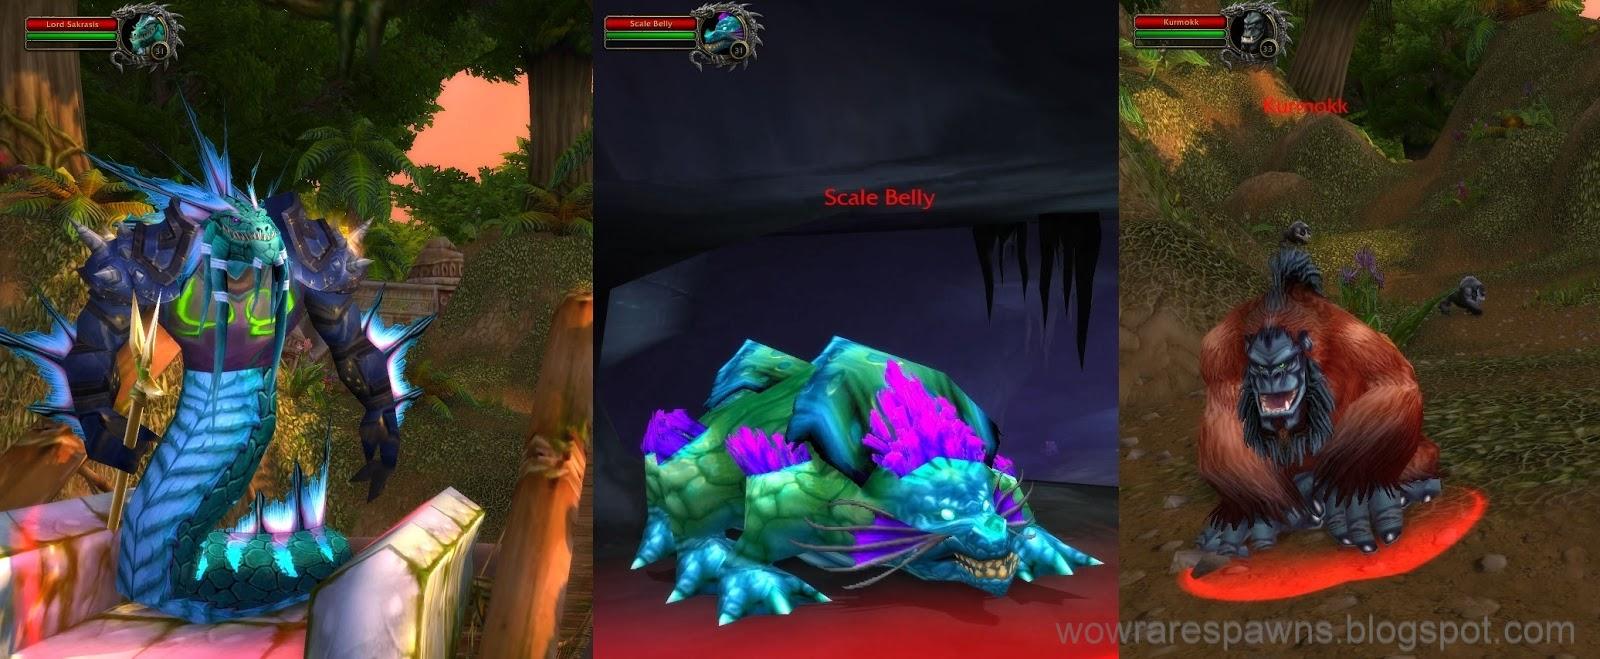 Rare companions | WoWWiki | FANDOM powered by Wikia